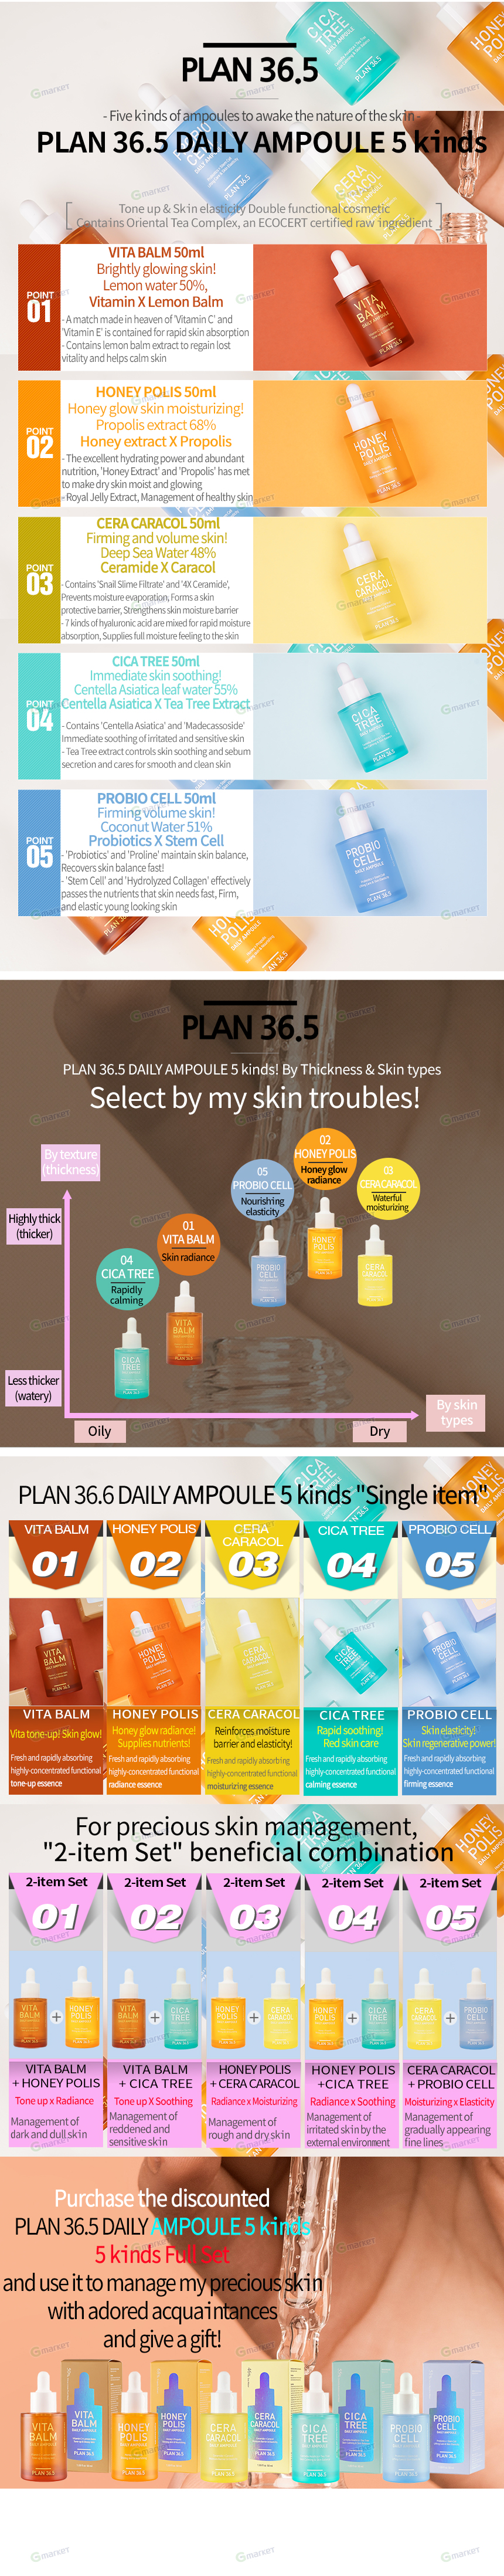 PLAN 36.5 Daily Ampoule